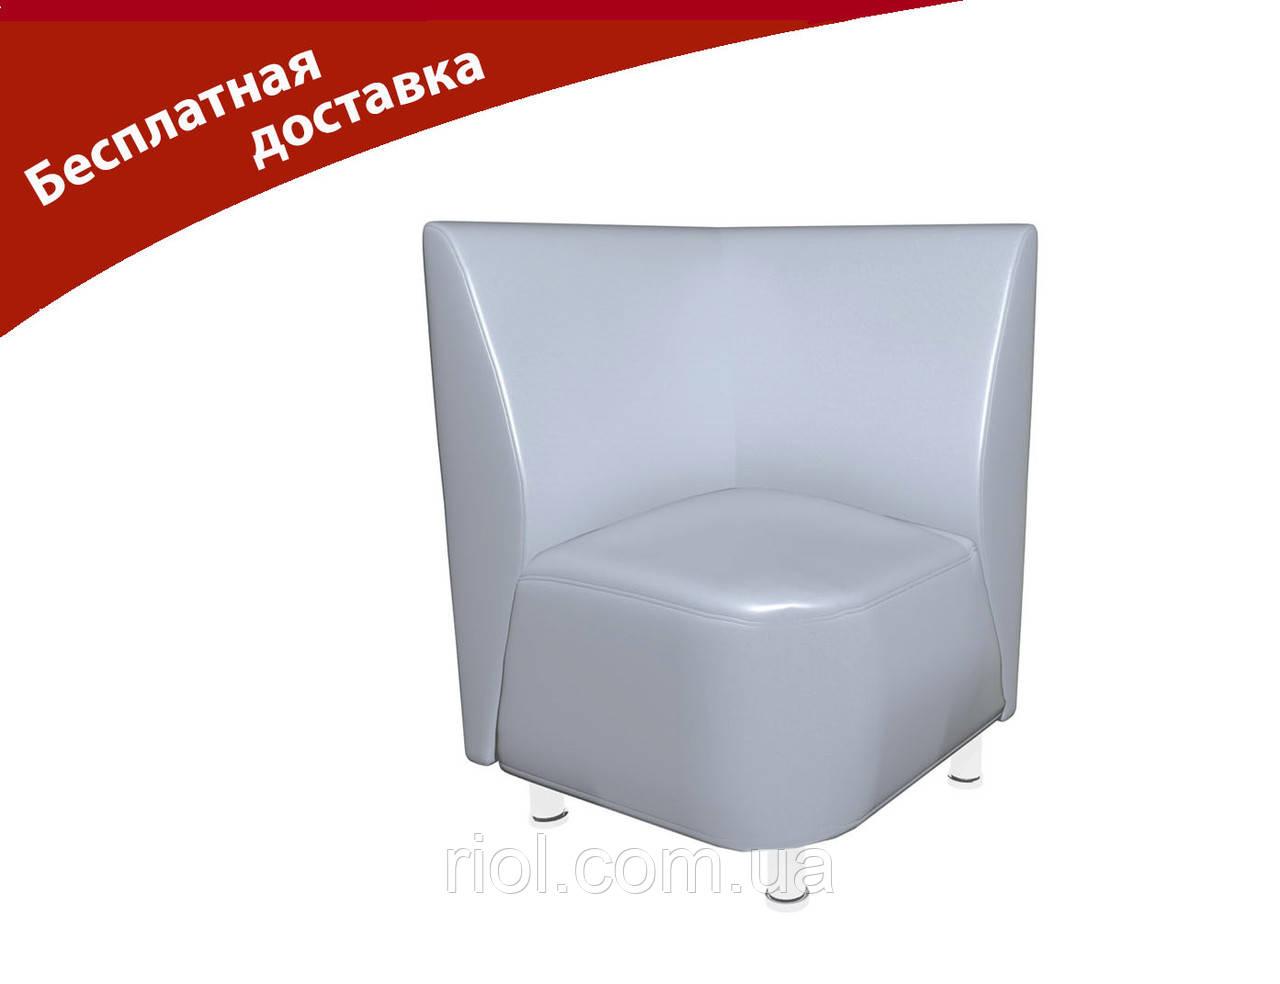 Кресло-угол белый